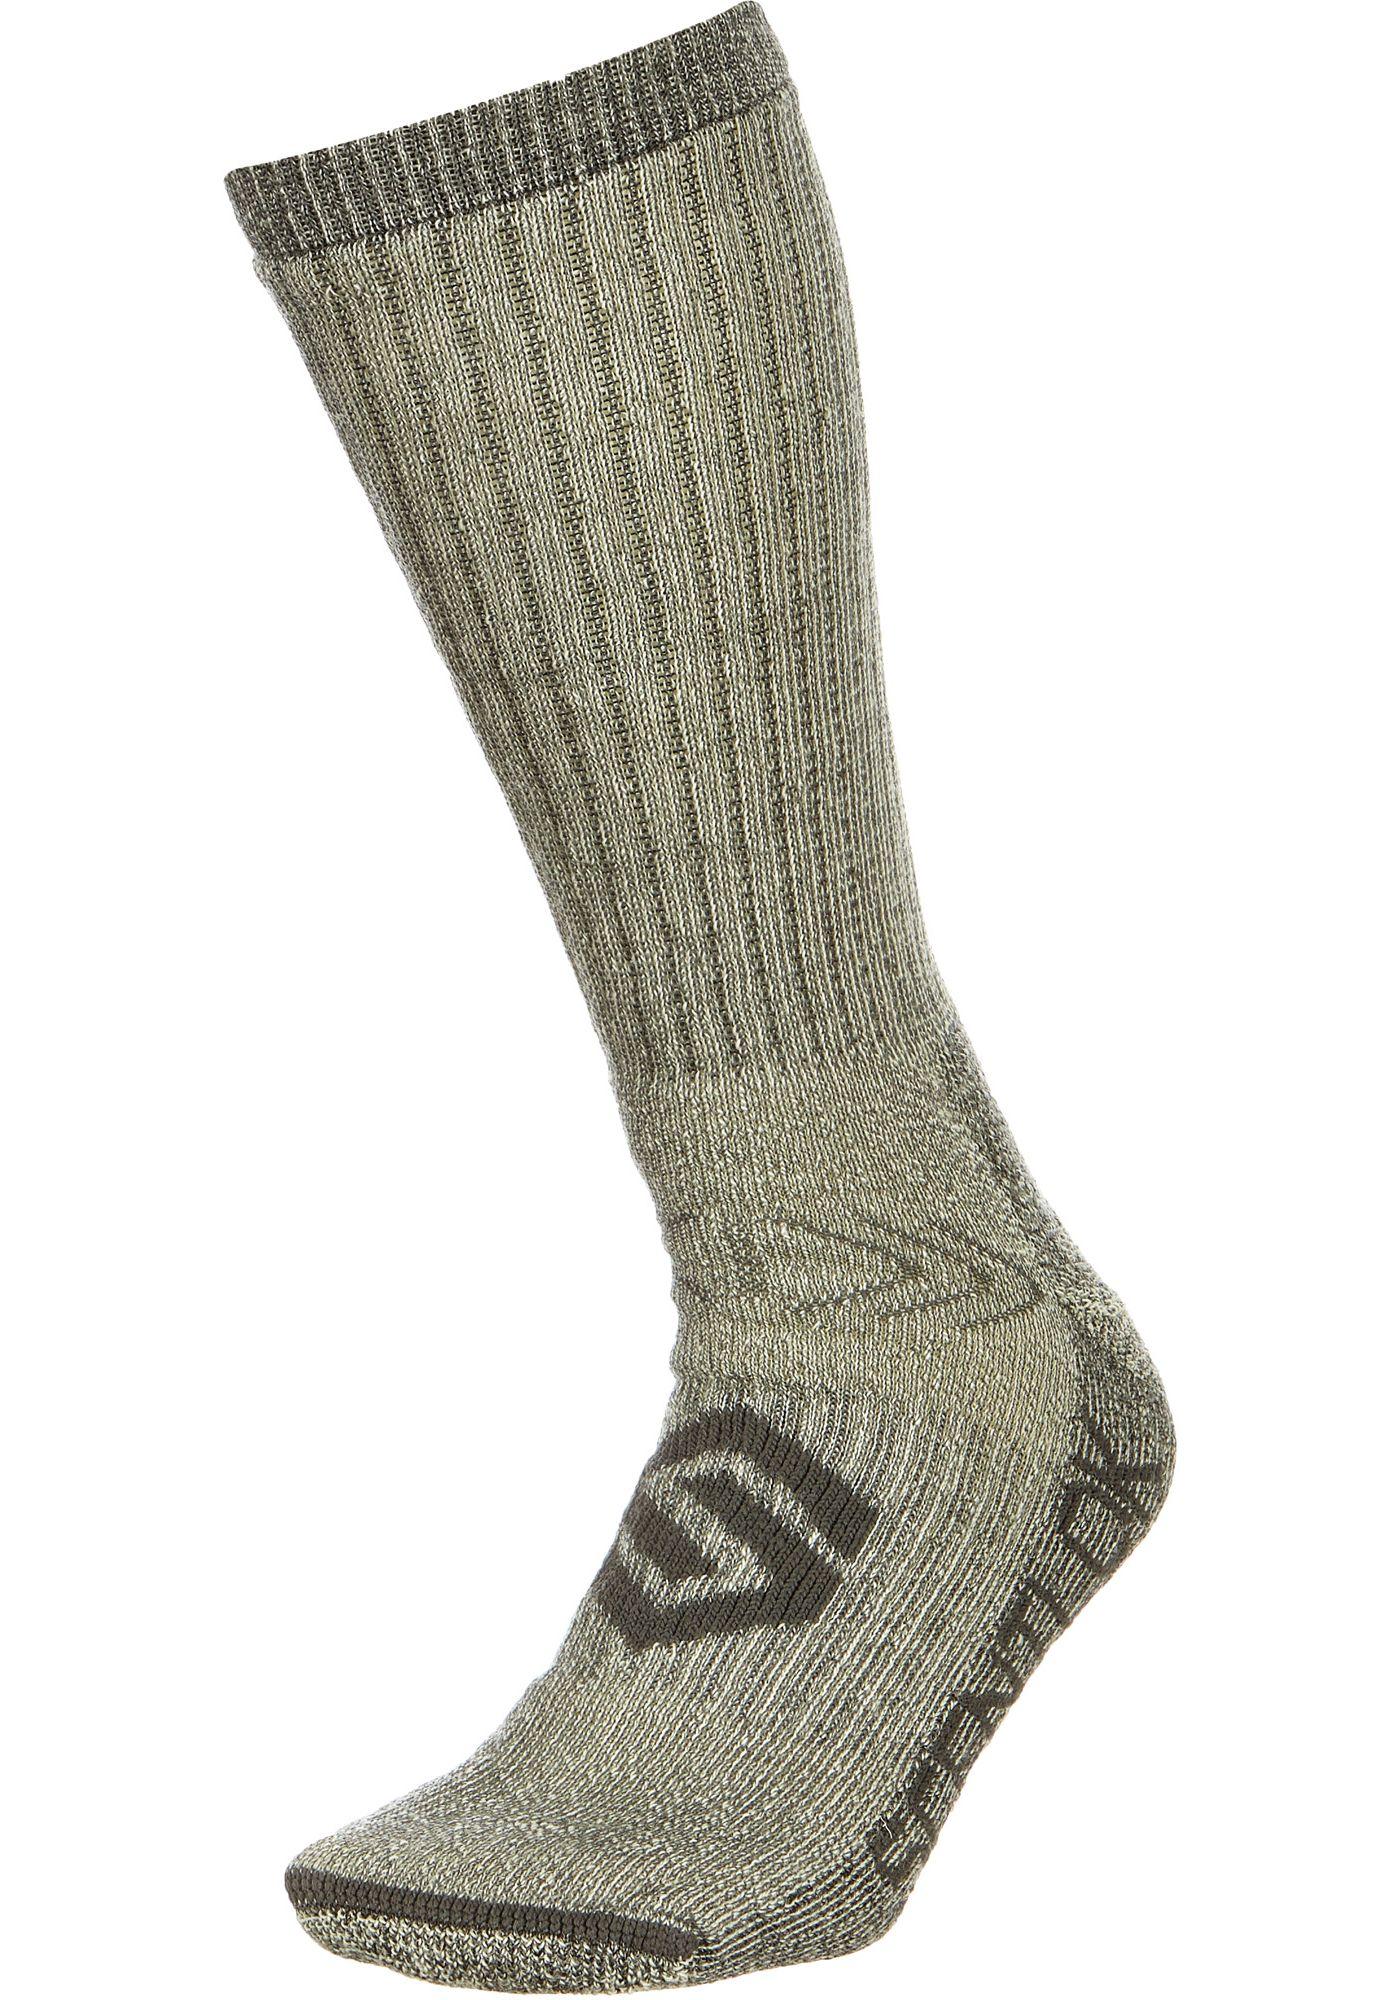 ScentLok Men's Thermal Boot Socks